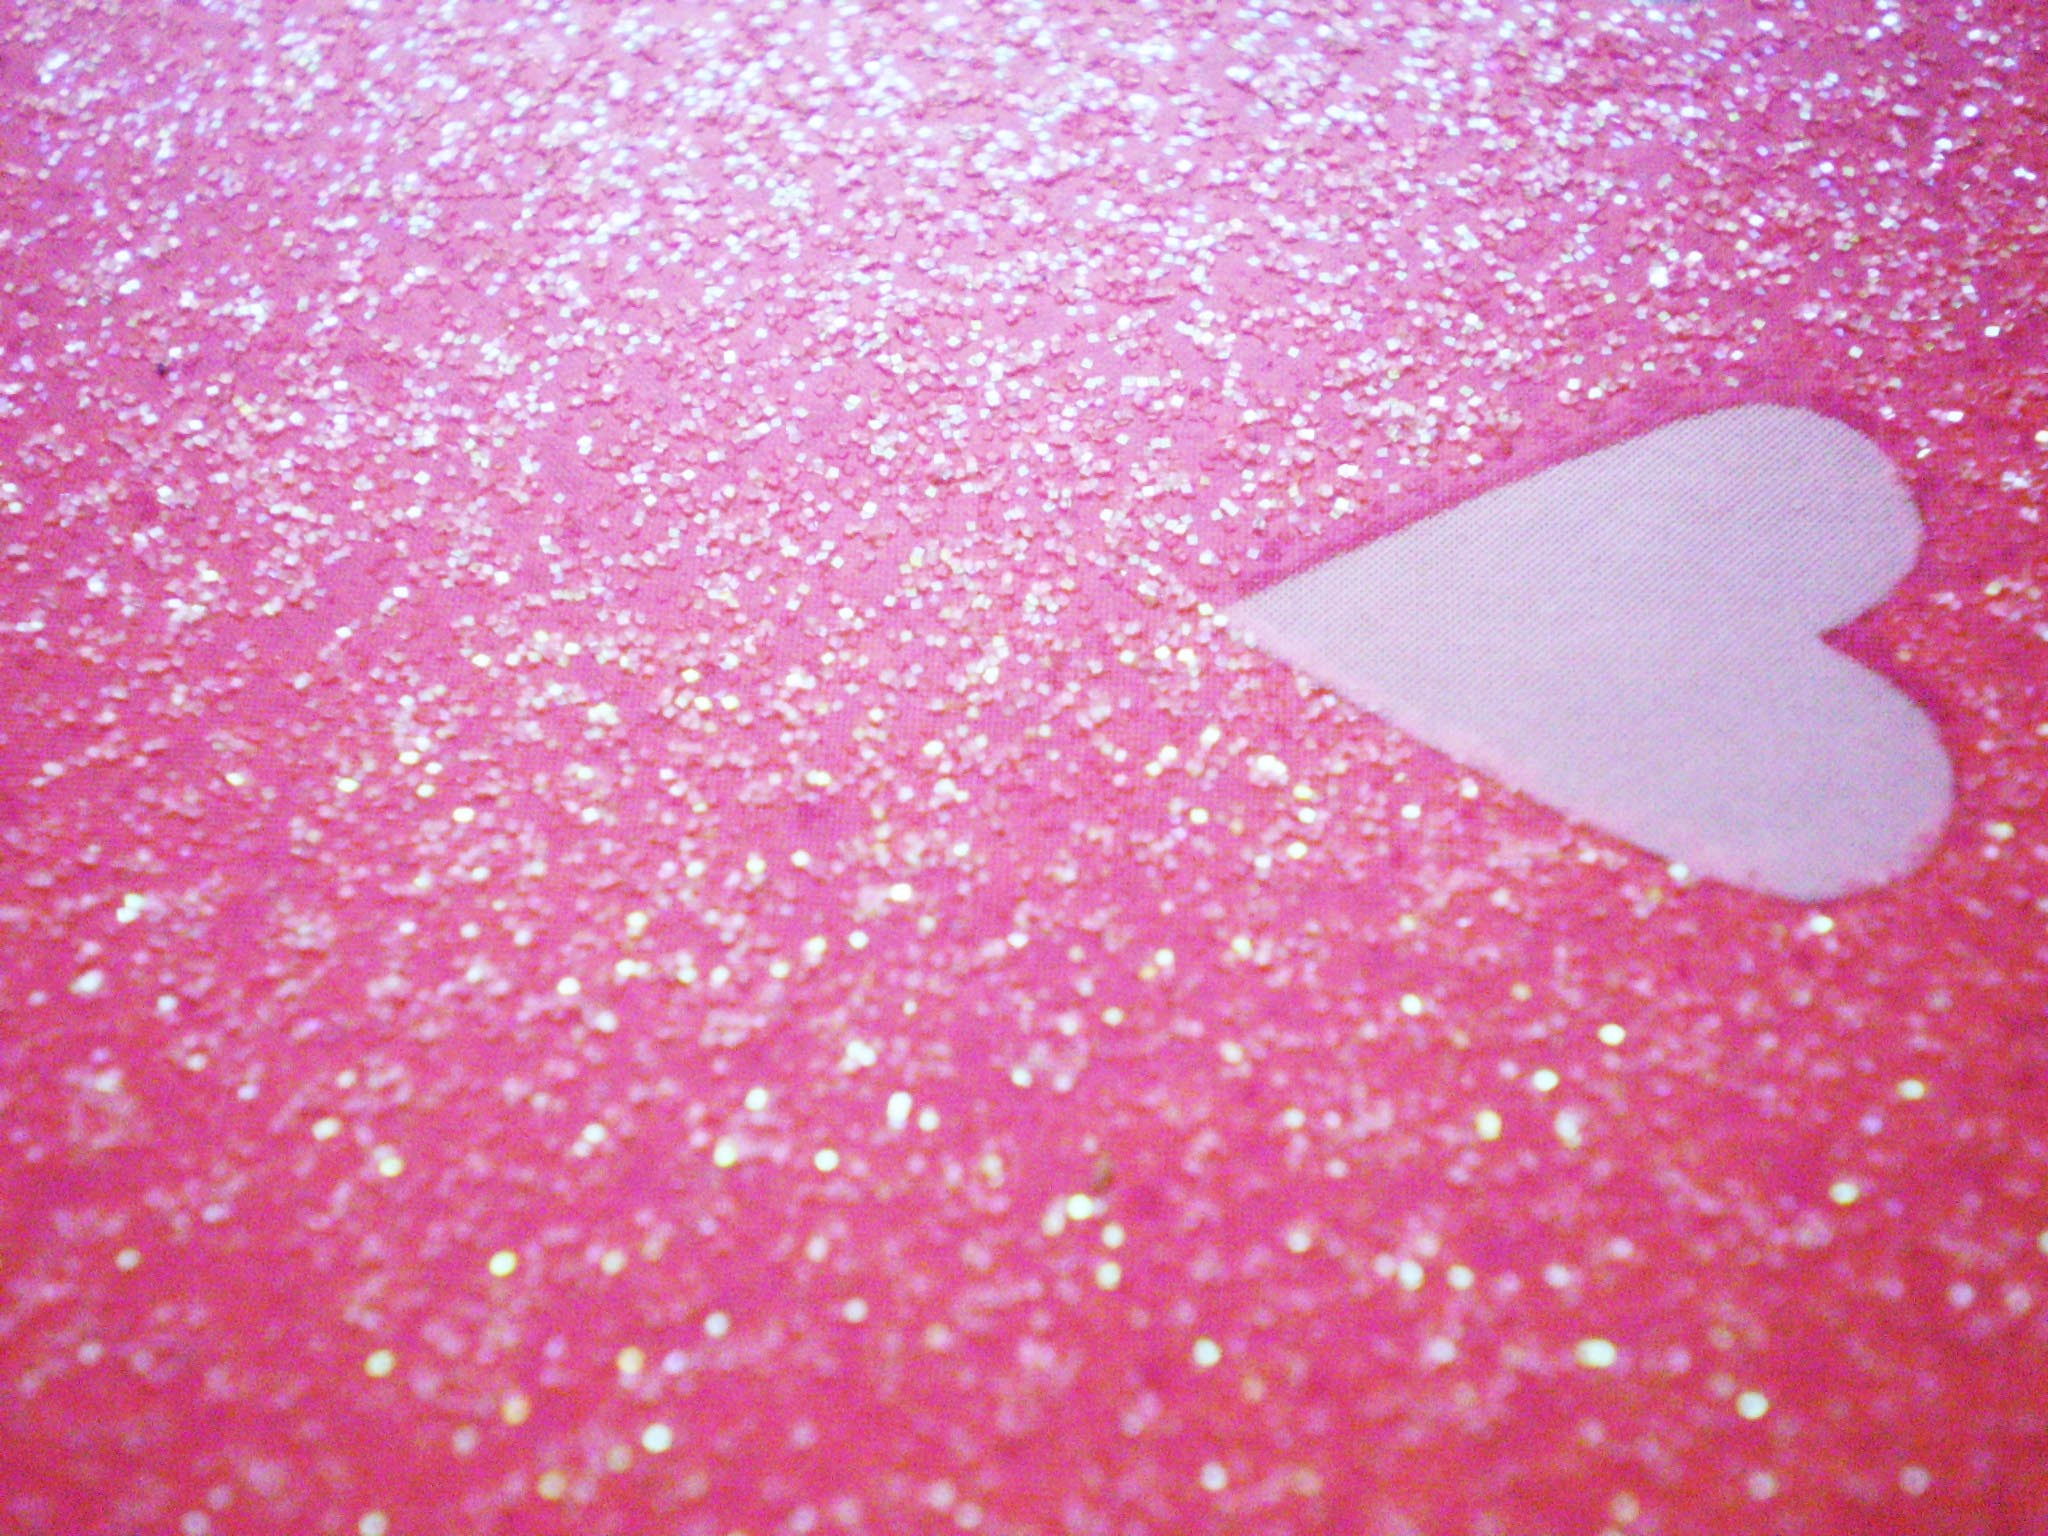 Missing Pink Glitter Heart